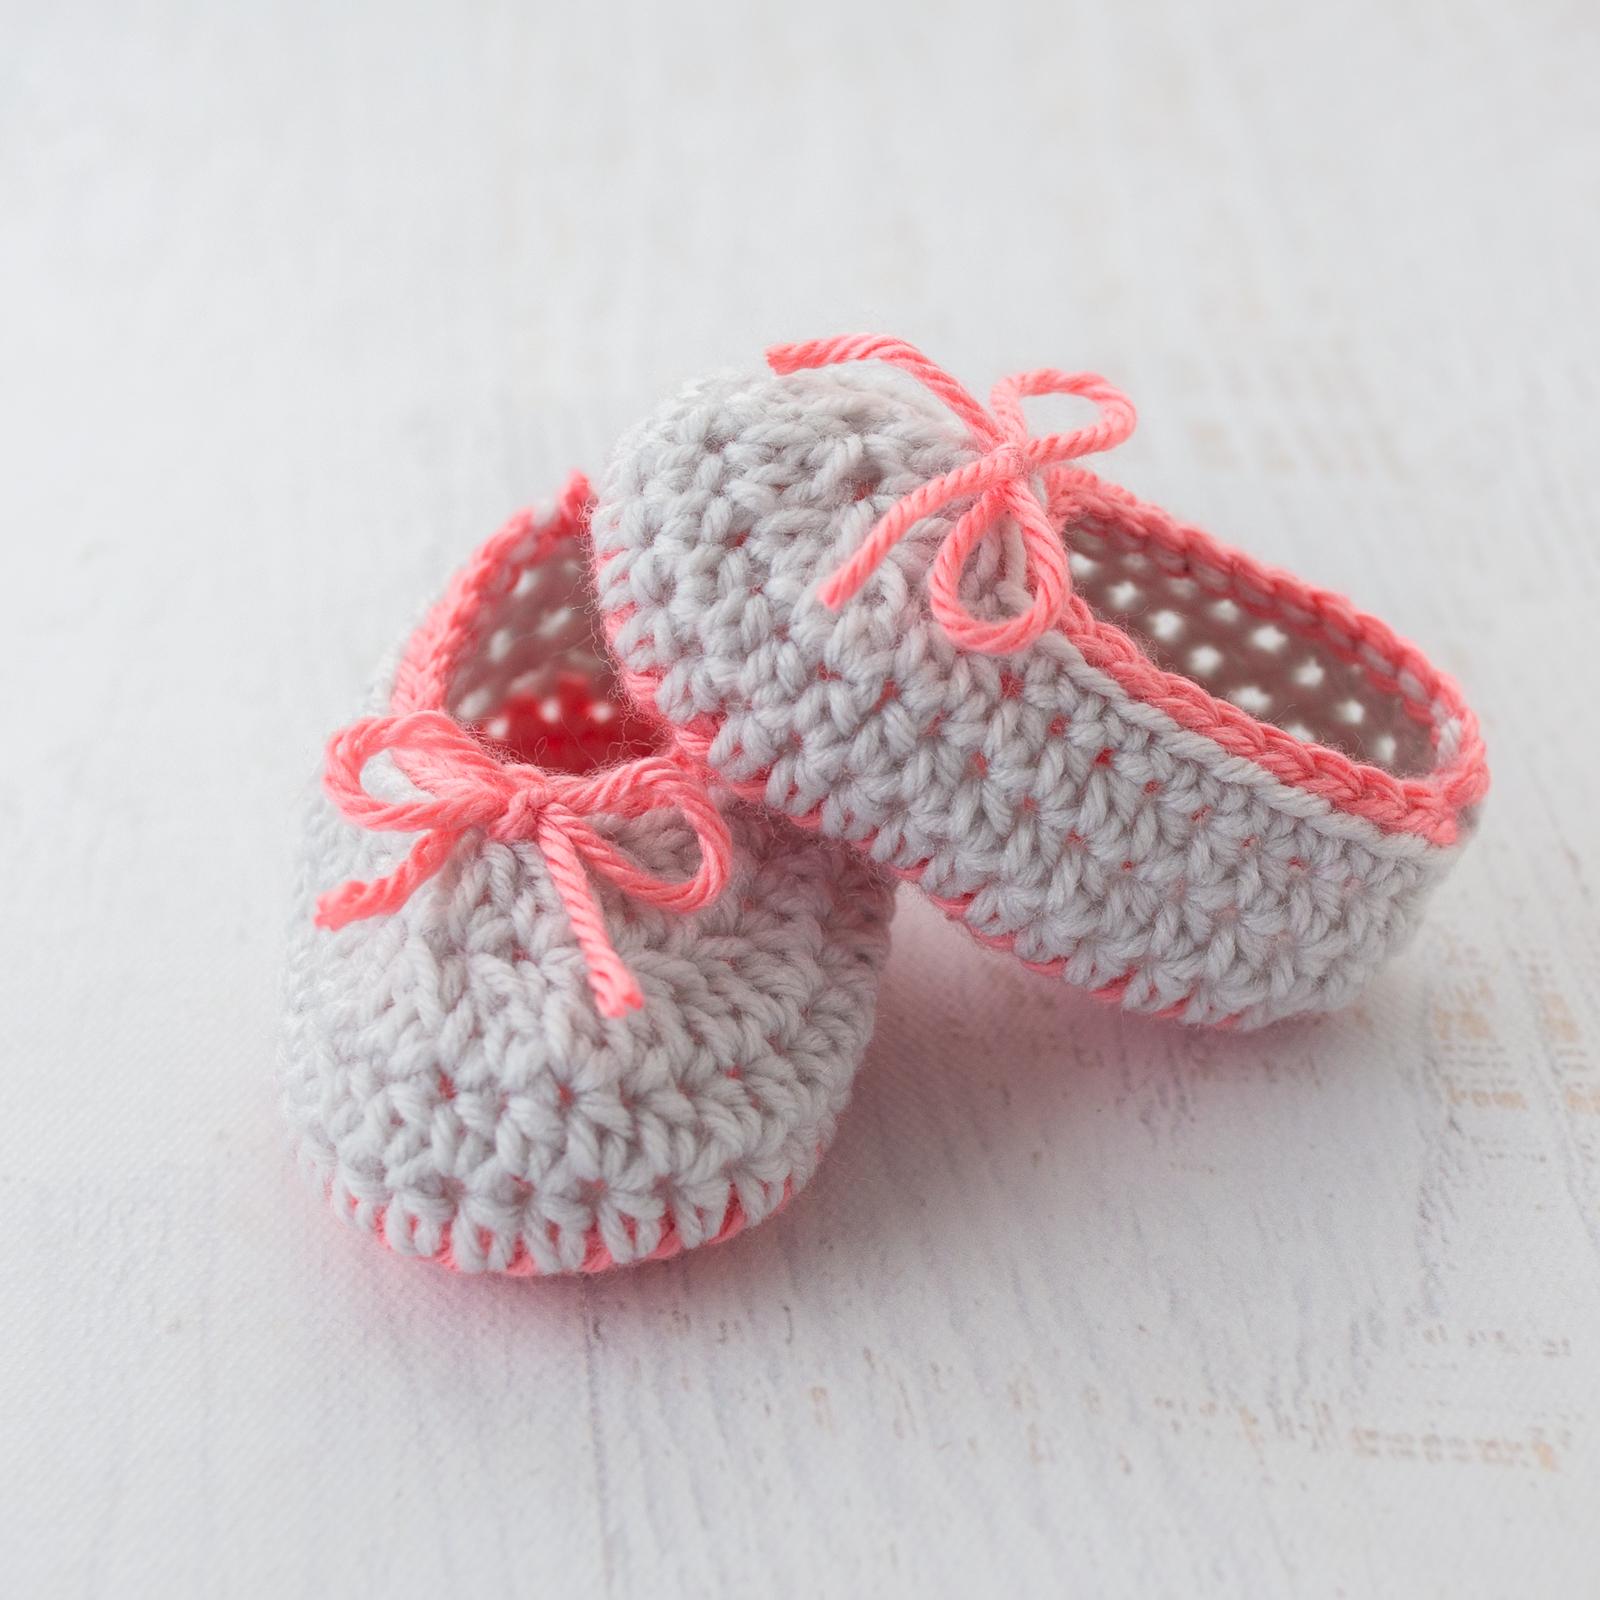 Neon Trim Baby Slippers Free Crochet Pattern Loganberry Handmade